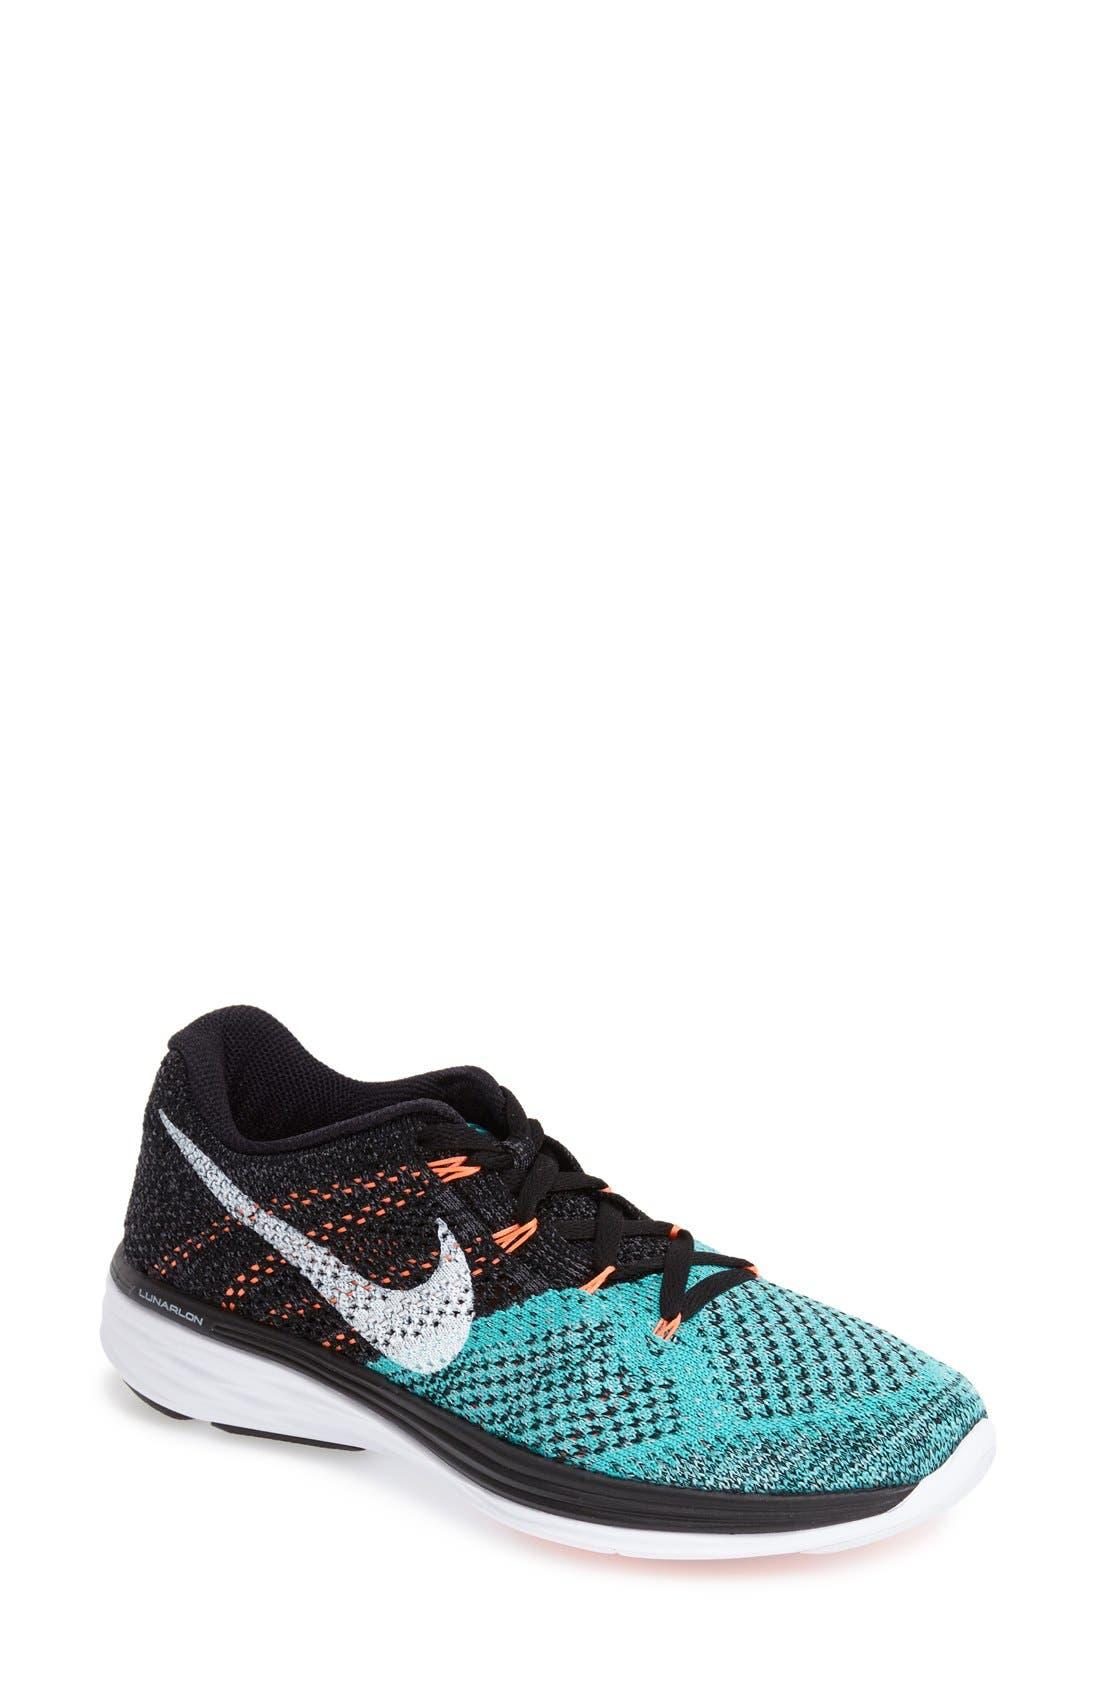 Alternate Image 1 Selected - Nike 'Flyknit Lunar 3' Running Shoe (Women)